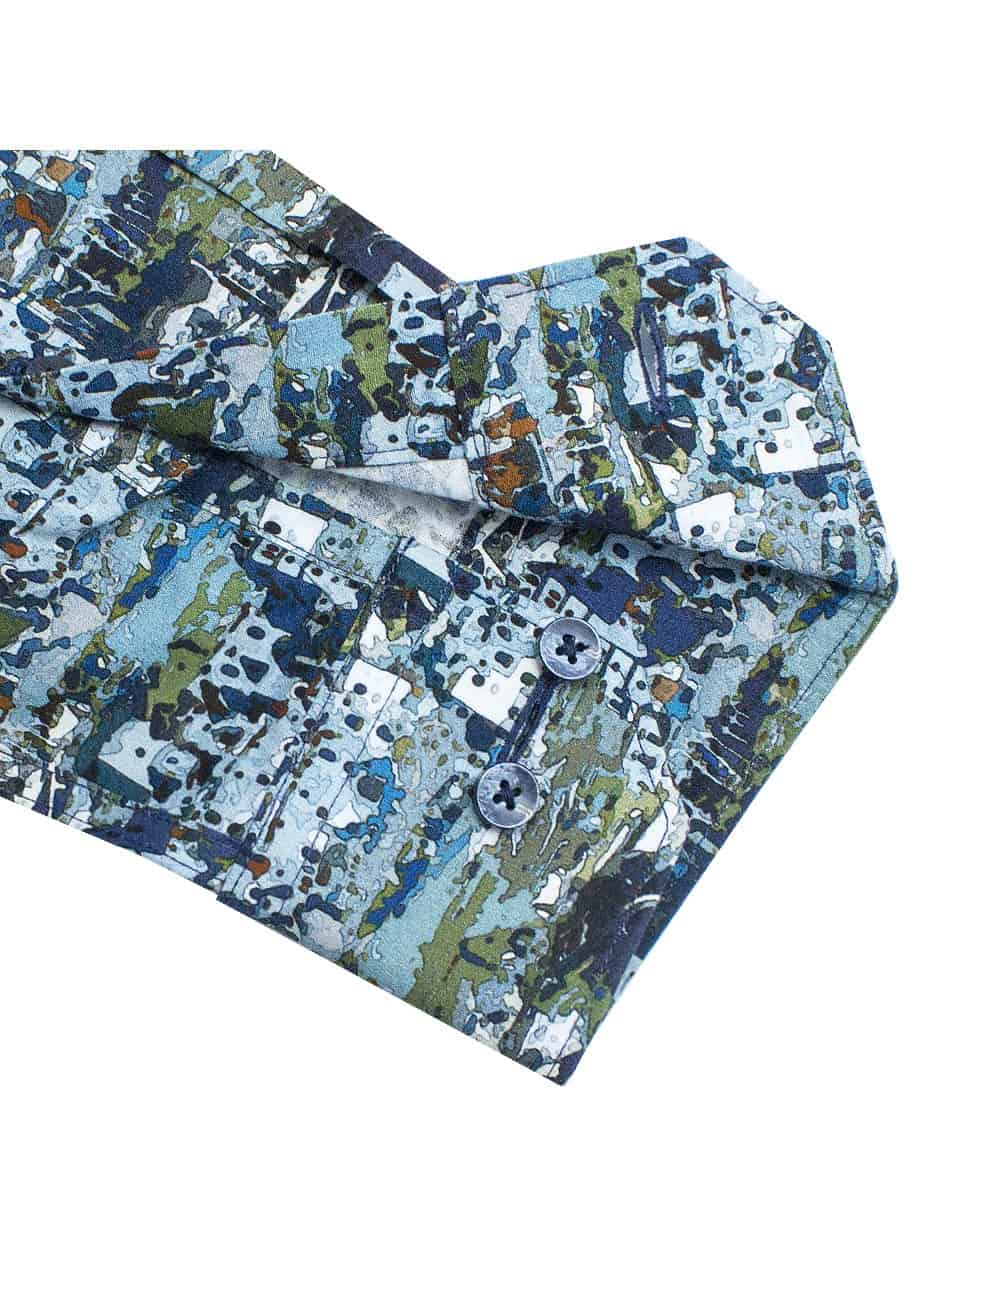 Tailored Fit 100% Premium Cotton Digitally Printed Blue Print Italian Fabric Silky Finish Long Sleeve Single Cuff Shirt TF1A7.18